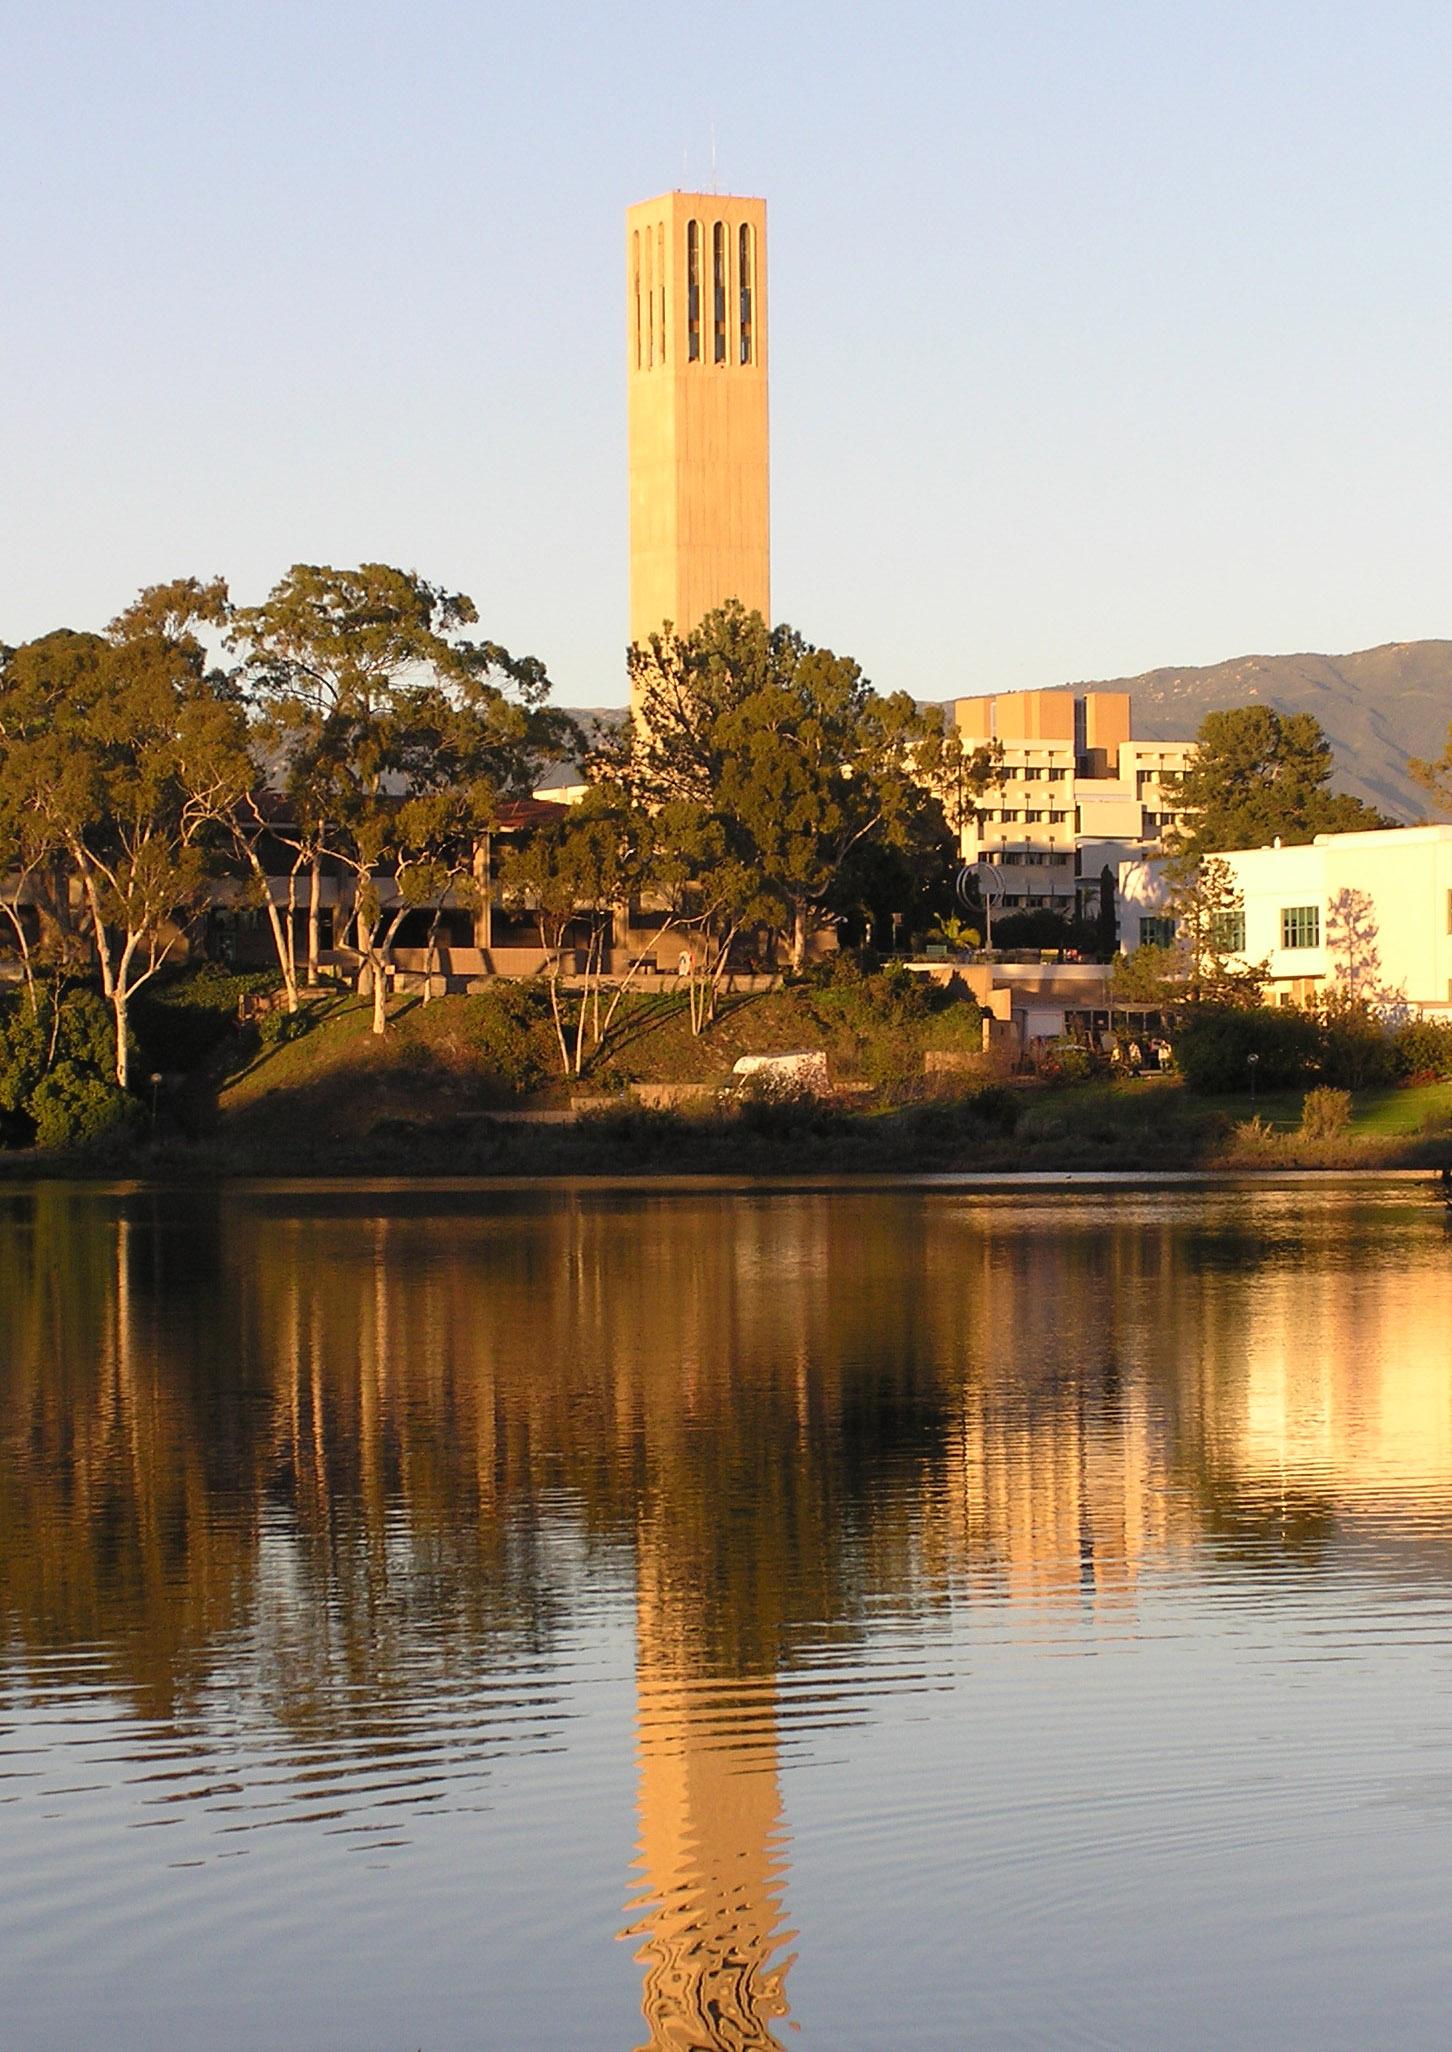 Santa Barbara Hotels >> Storke Tower, Santa Barbara | Roadtrippers